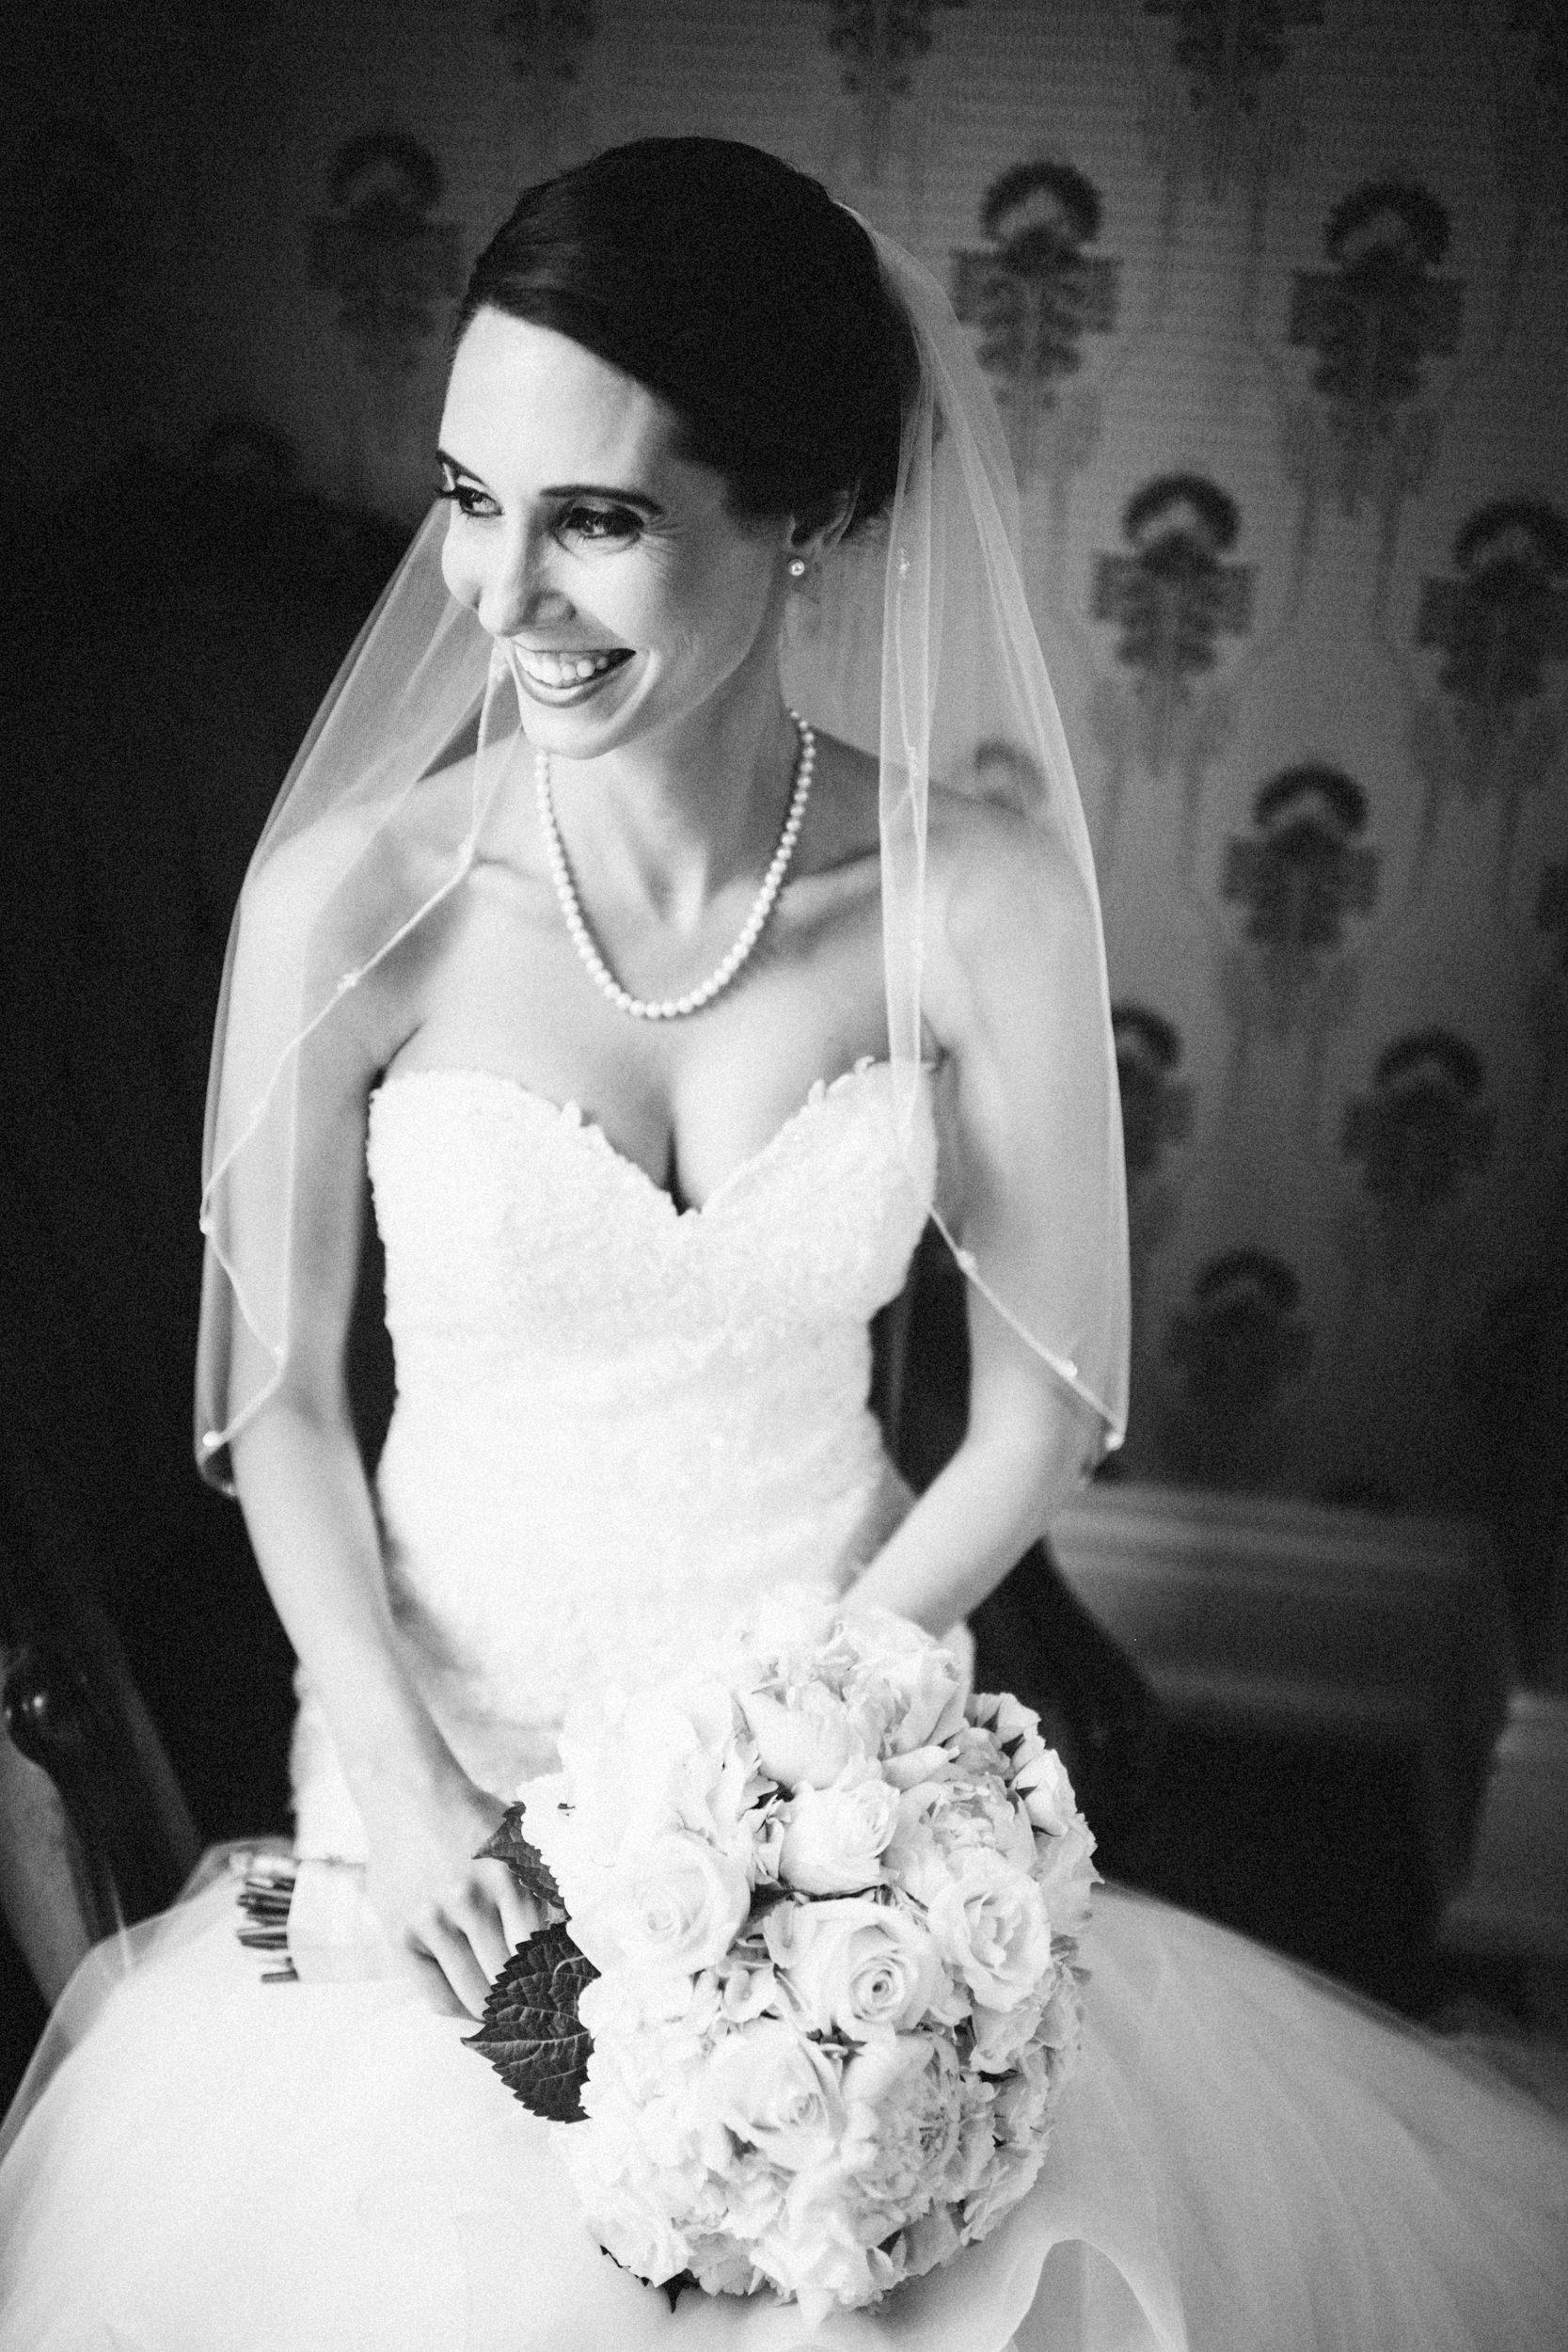 Louisville-Kentucky-Wedding-Elopement-Photographer-Sarah-Katherine-Davis-Photography-Whitehall-Classic-Timeless-Garden-Wedding-200.jpg